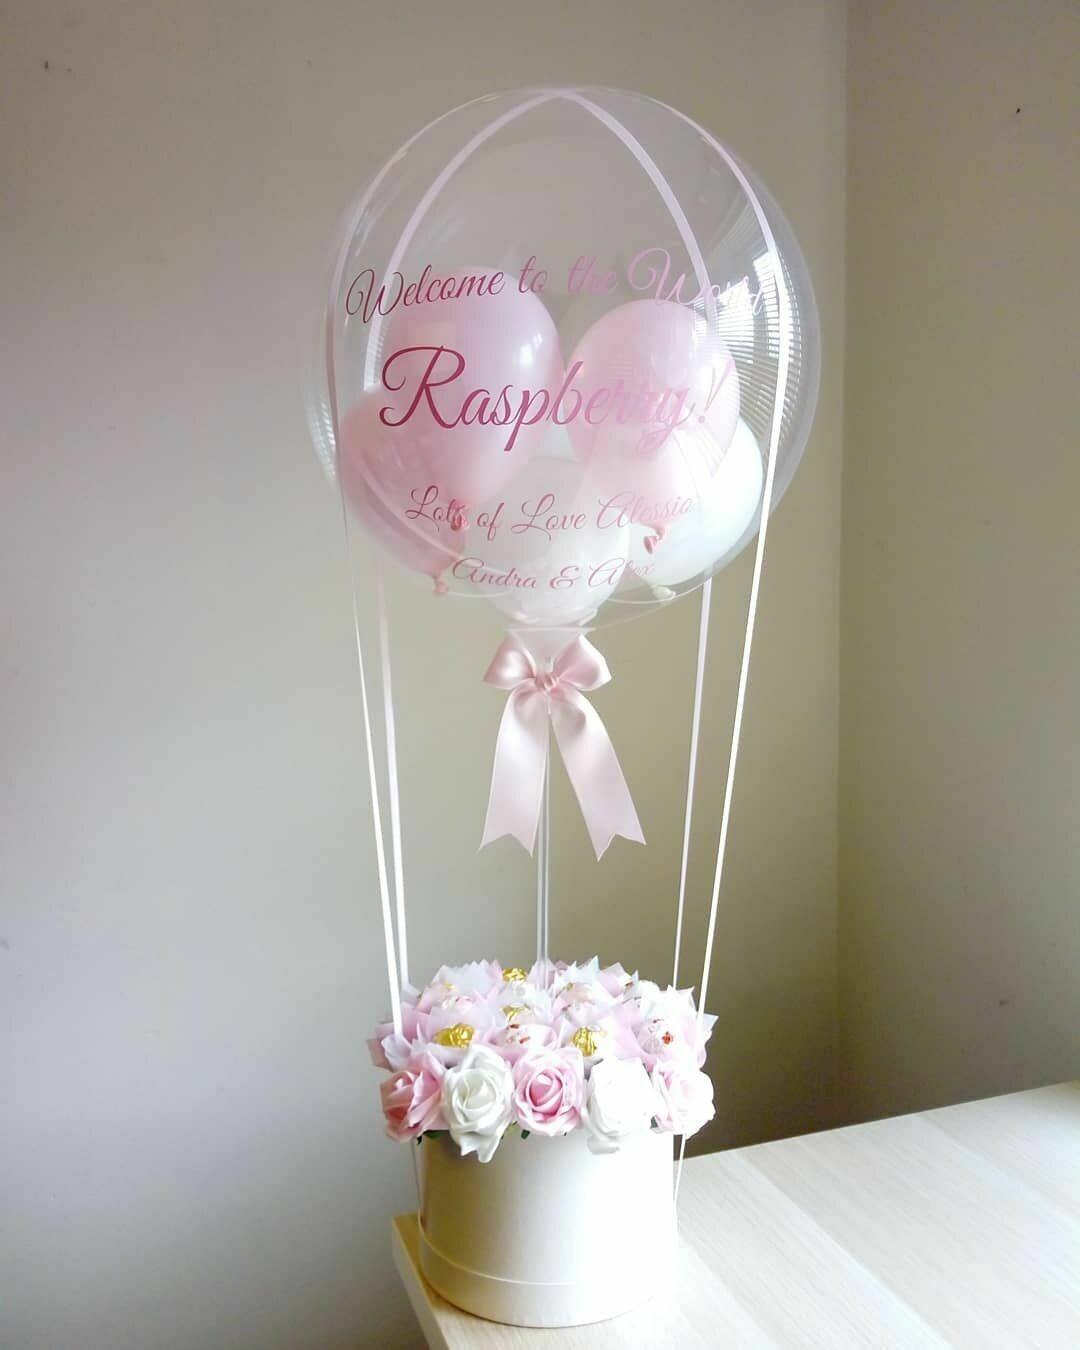 Hot Air Balloon and Flower Bouquet